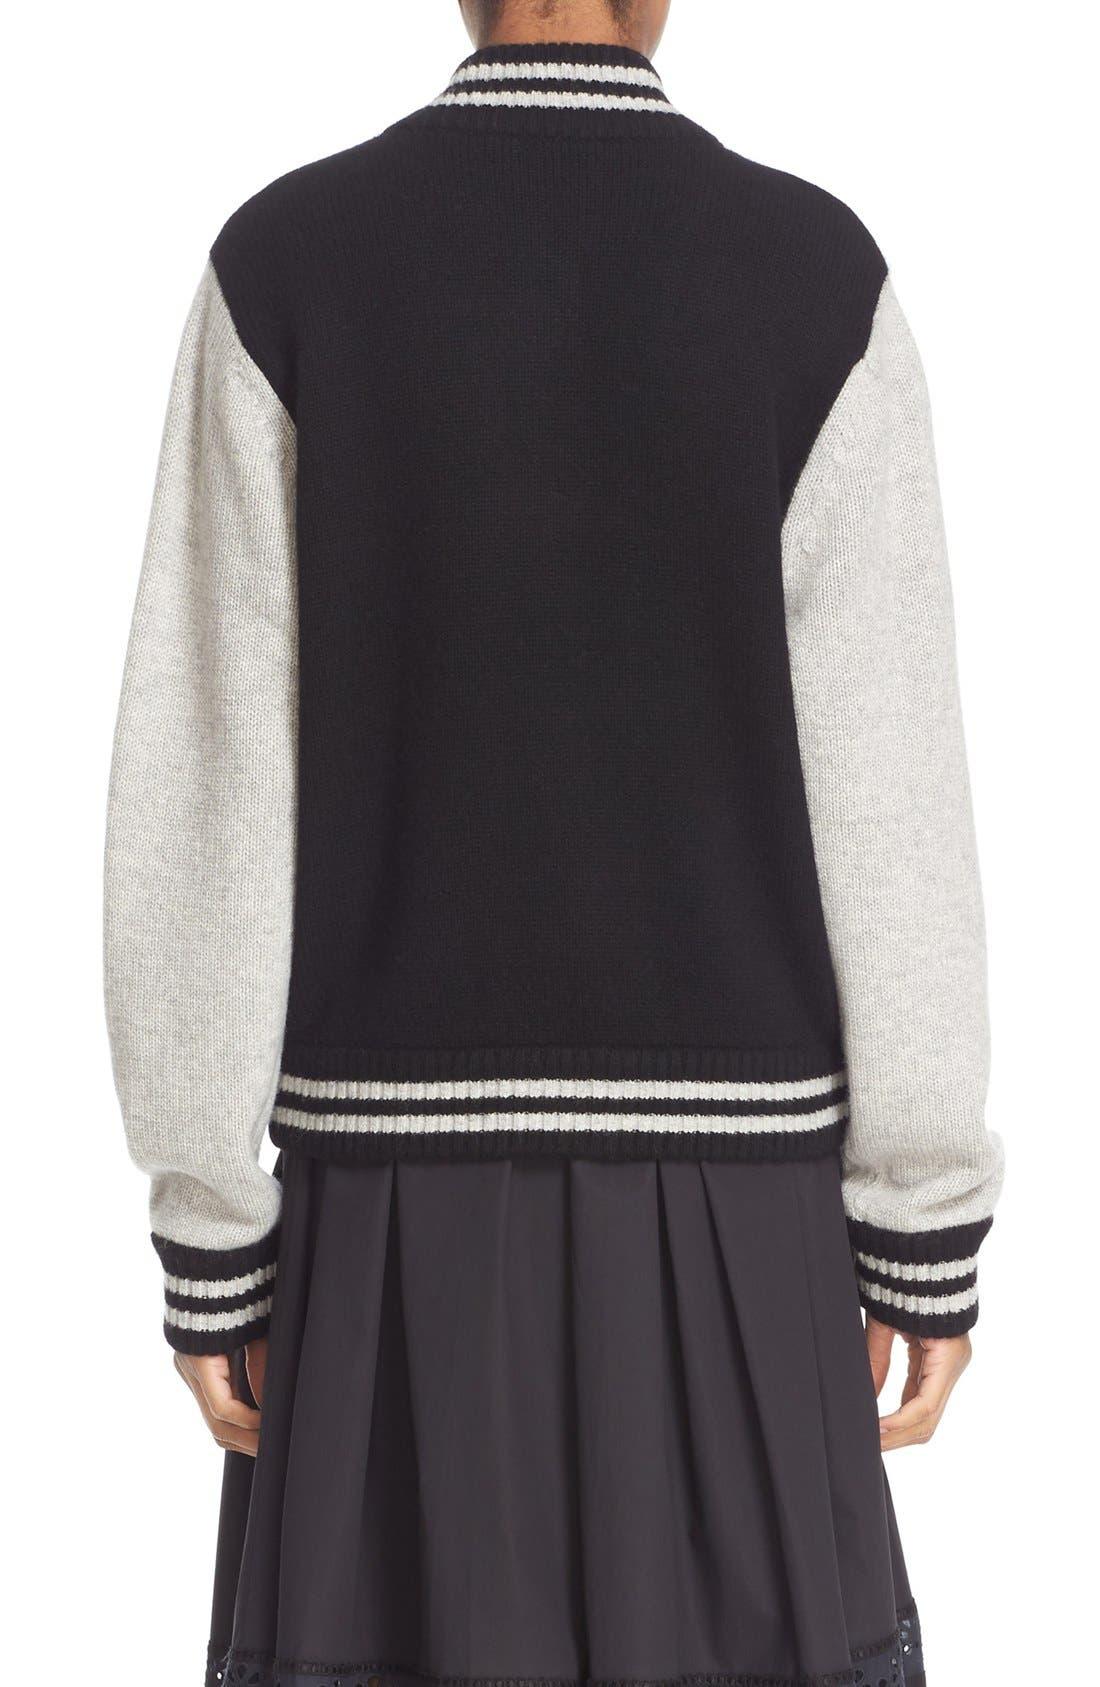 Stripe Detail Wool & Cashmere Knit Varsity Jacket,                             Alternate thumbnail 2, color,                             002